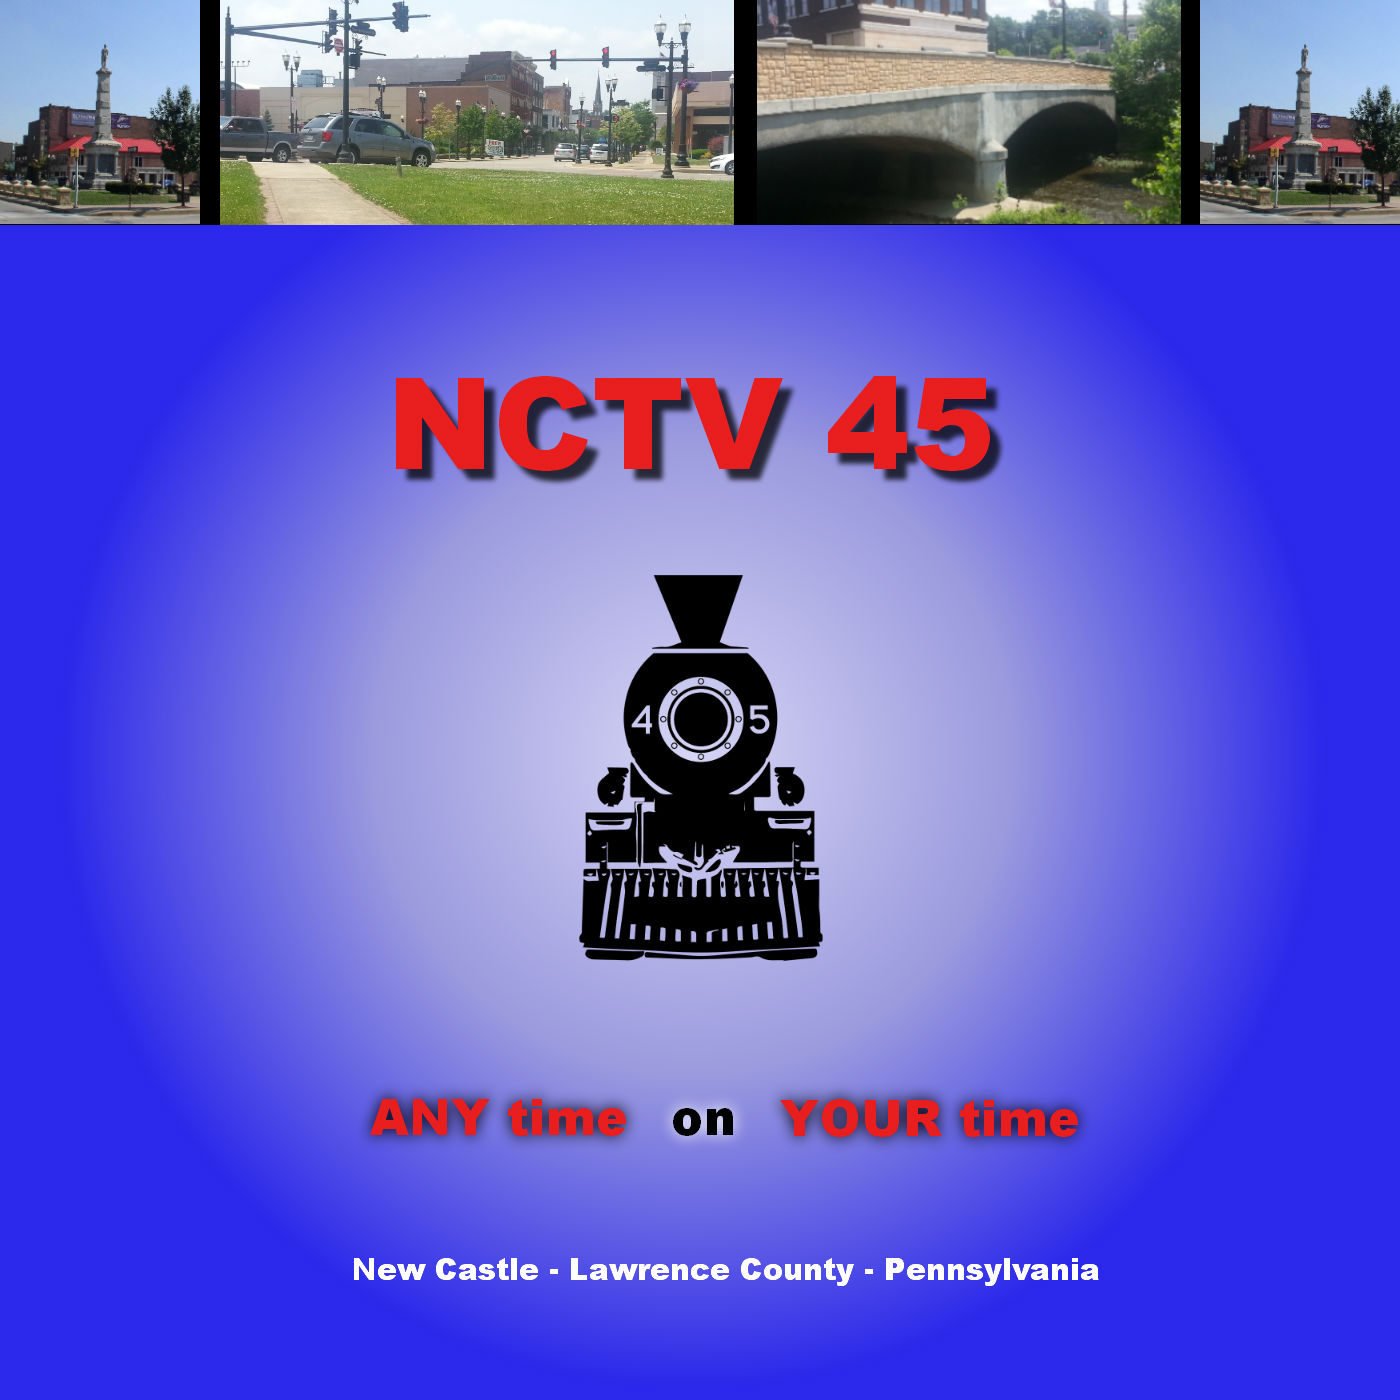 Artwork for NCTV45 LIVE Hockey (GYMHL) Poland GE  Vs Joint Effort Sunday 7 PM March 24 2019